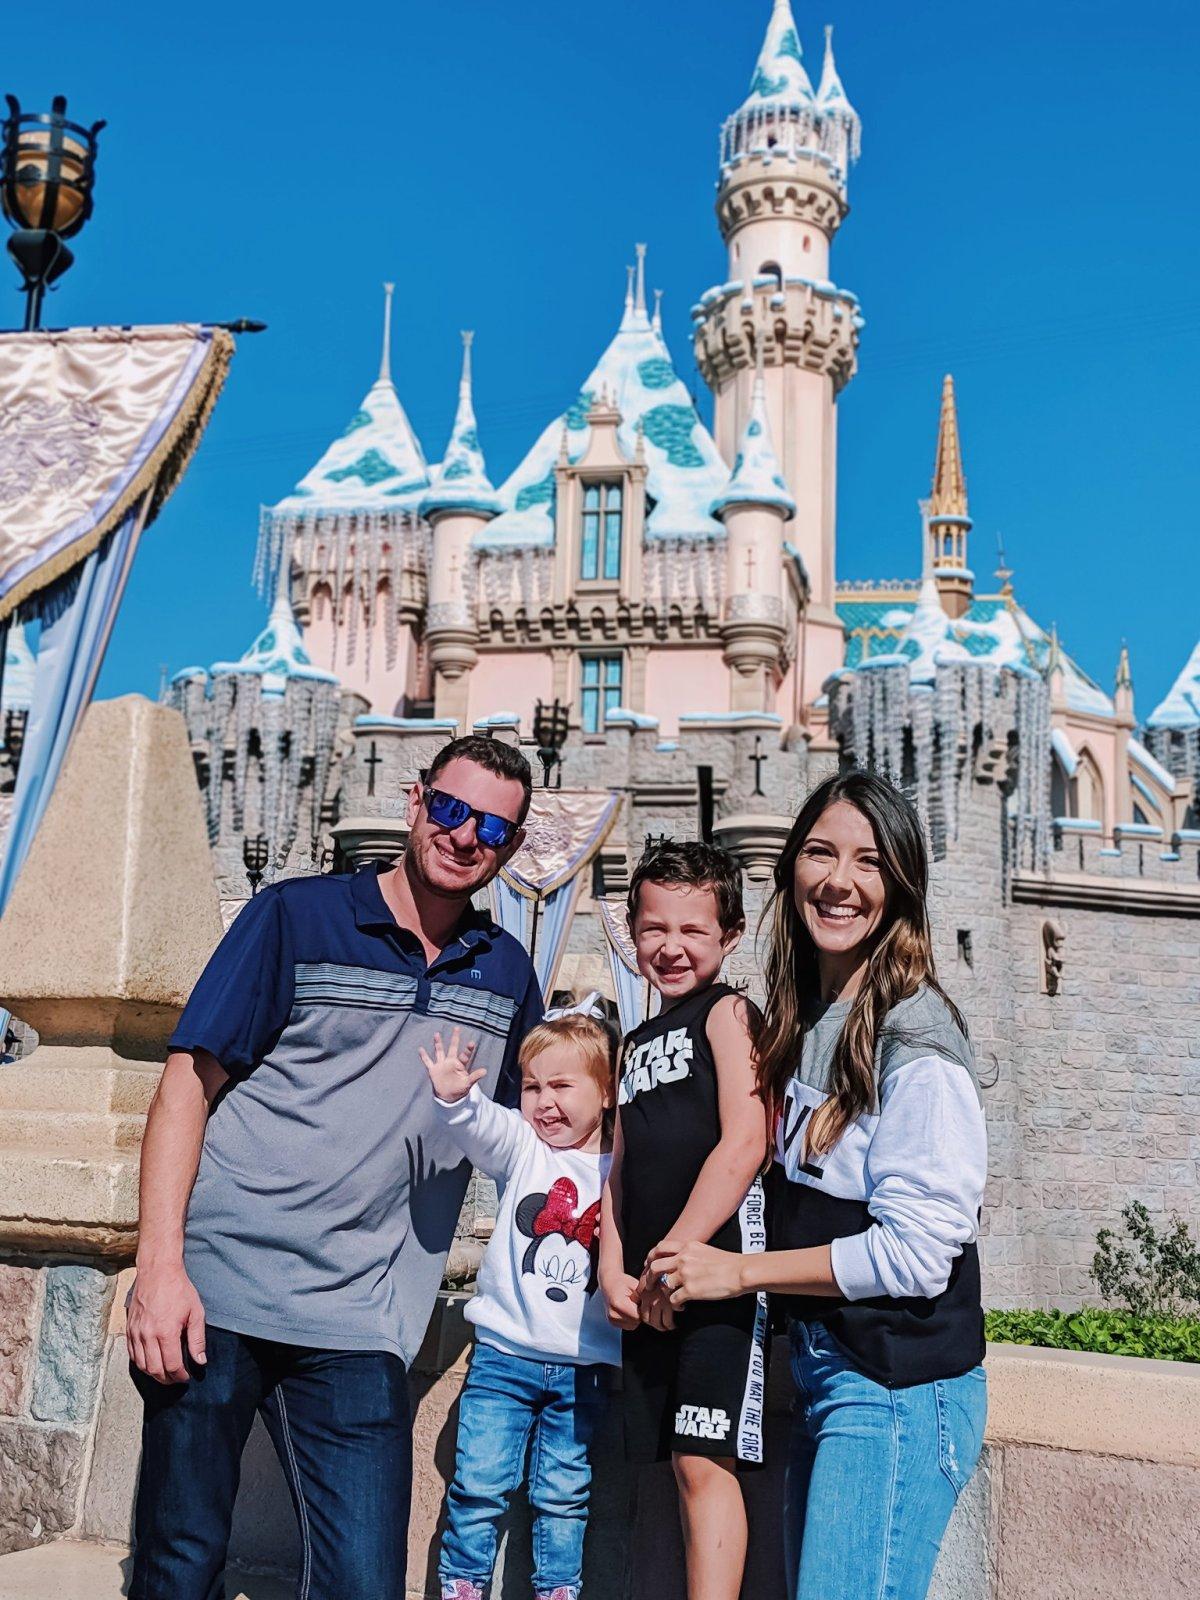 Our Disneyland Trip2018